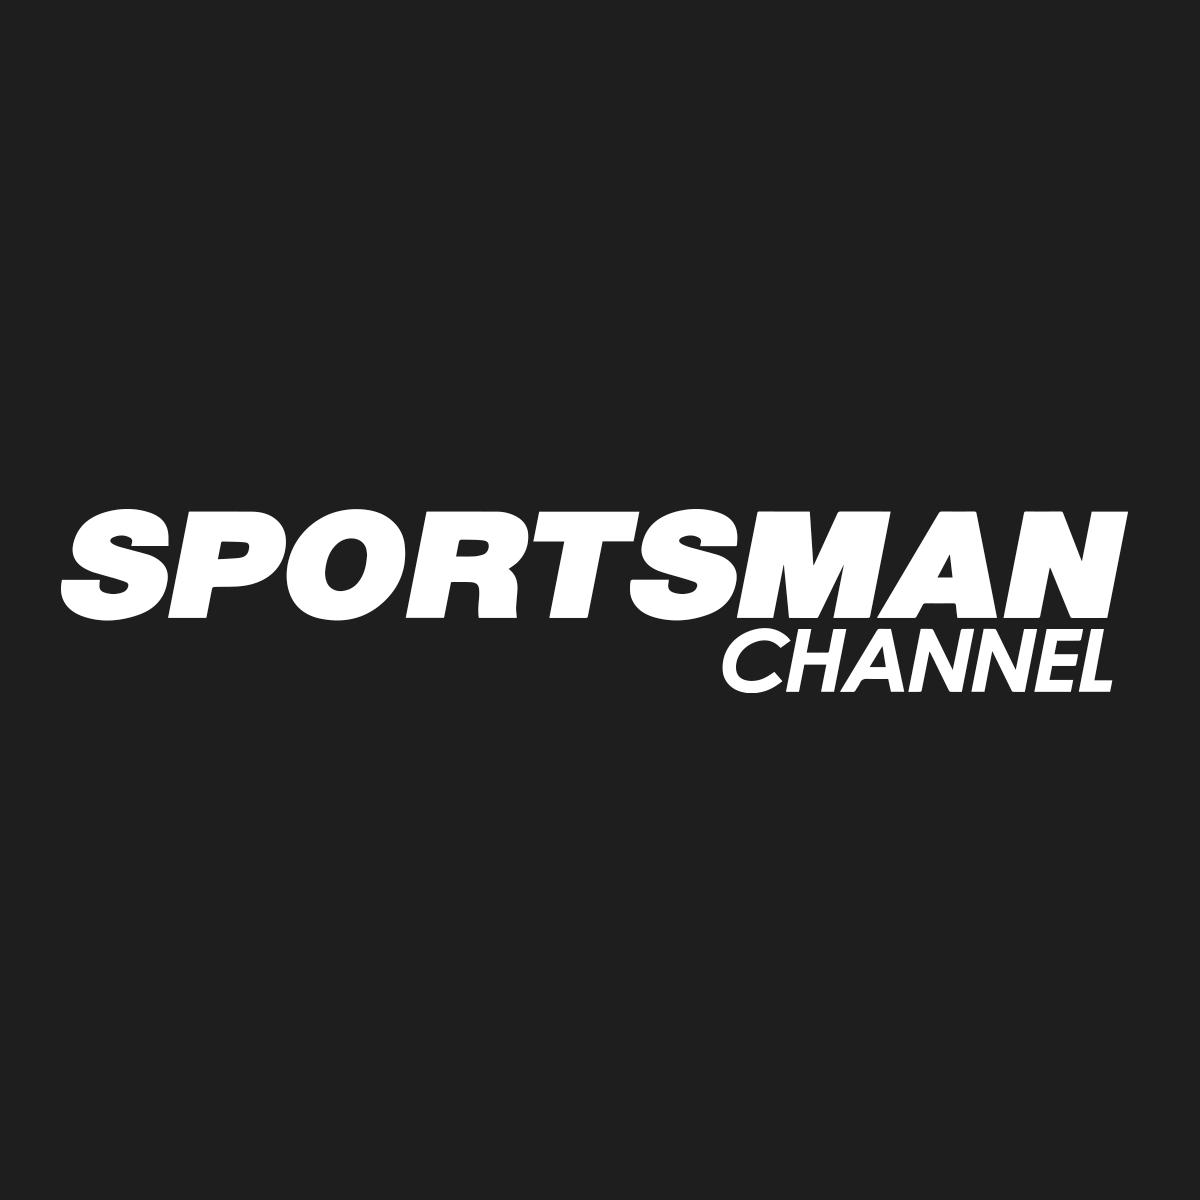 www.thesportsmanchannel.com